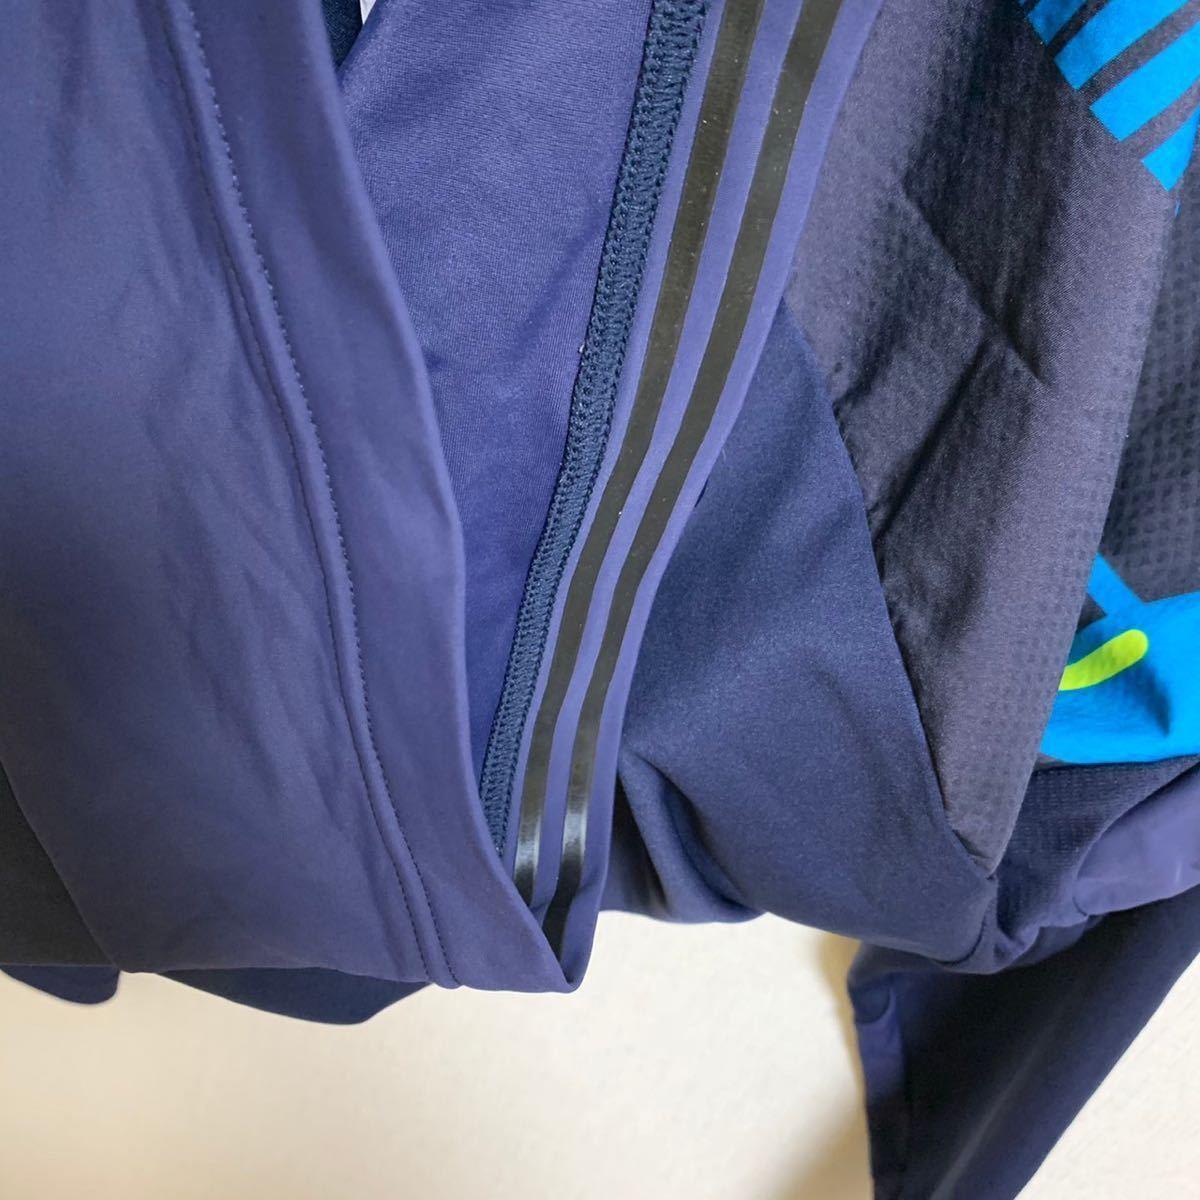 【XL】NEW BALANCE KAKUSEI 長袖 トレーニングウェア ランニングウェア ニューバランス スポーツウェア サッカー フットサル 陸上